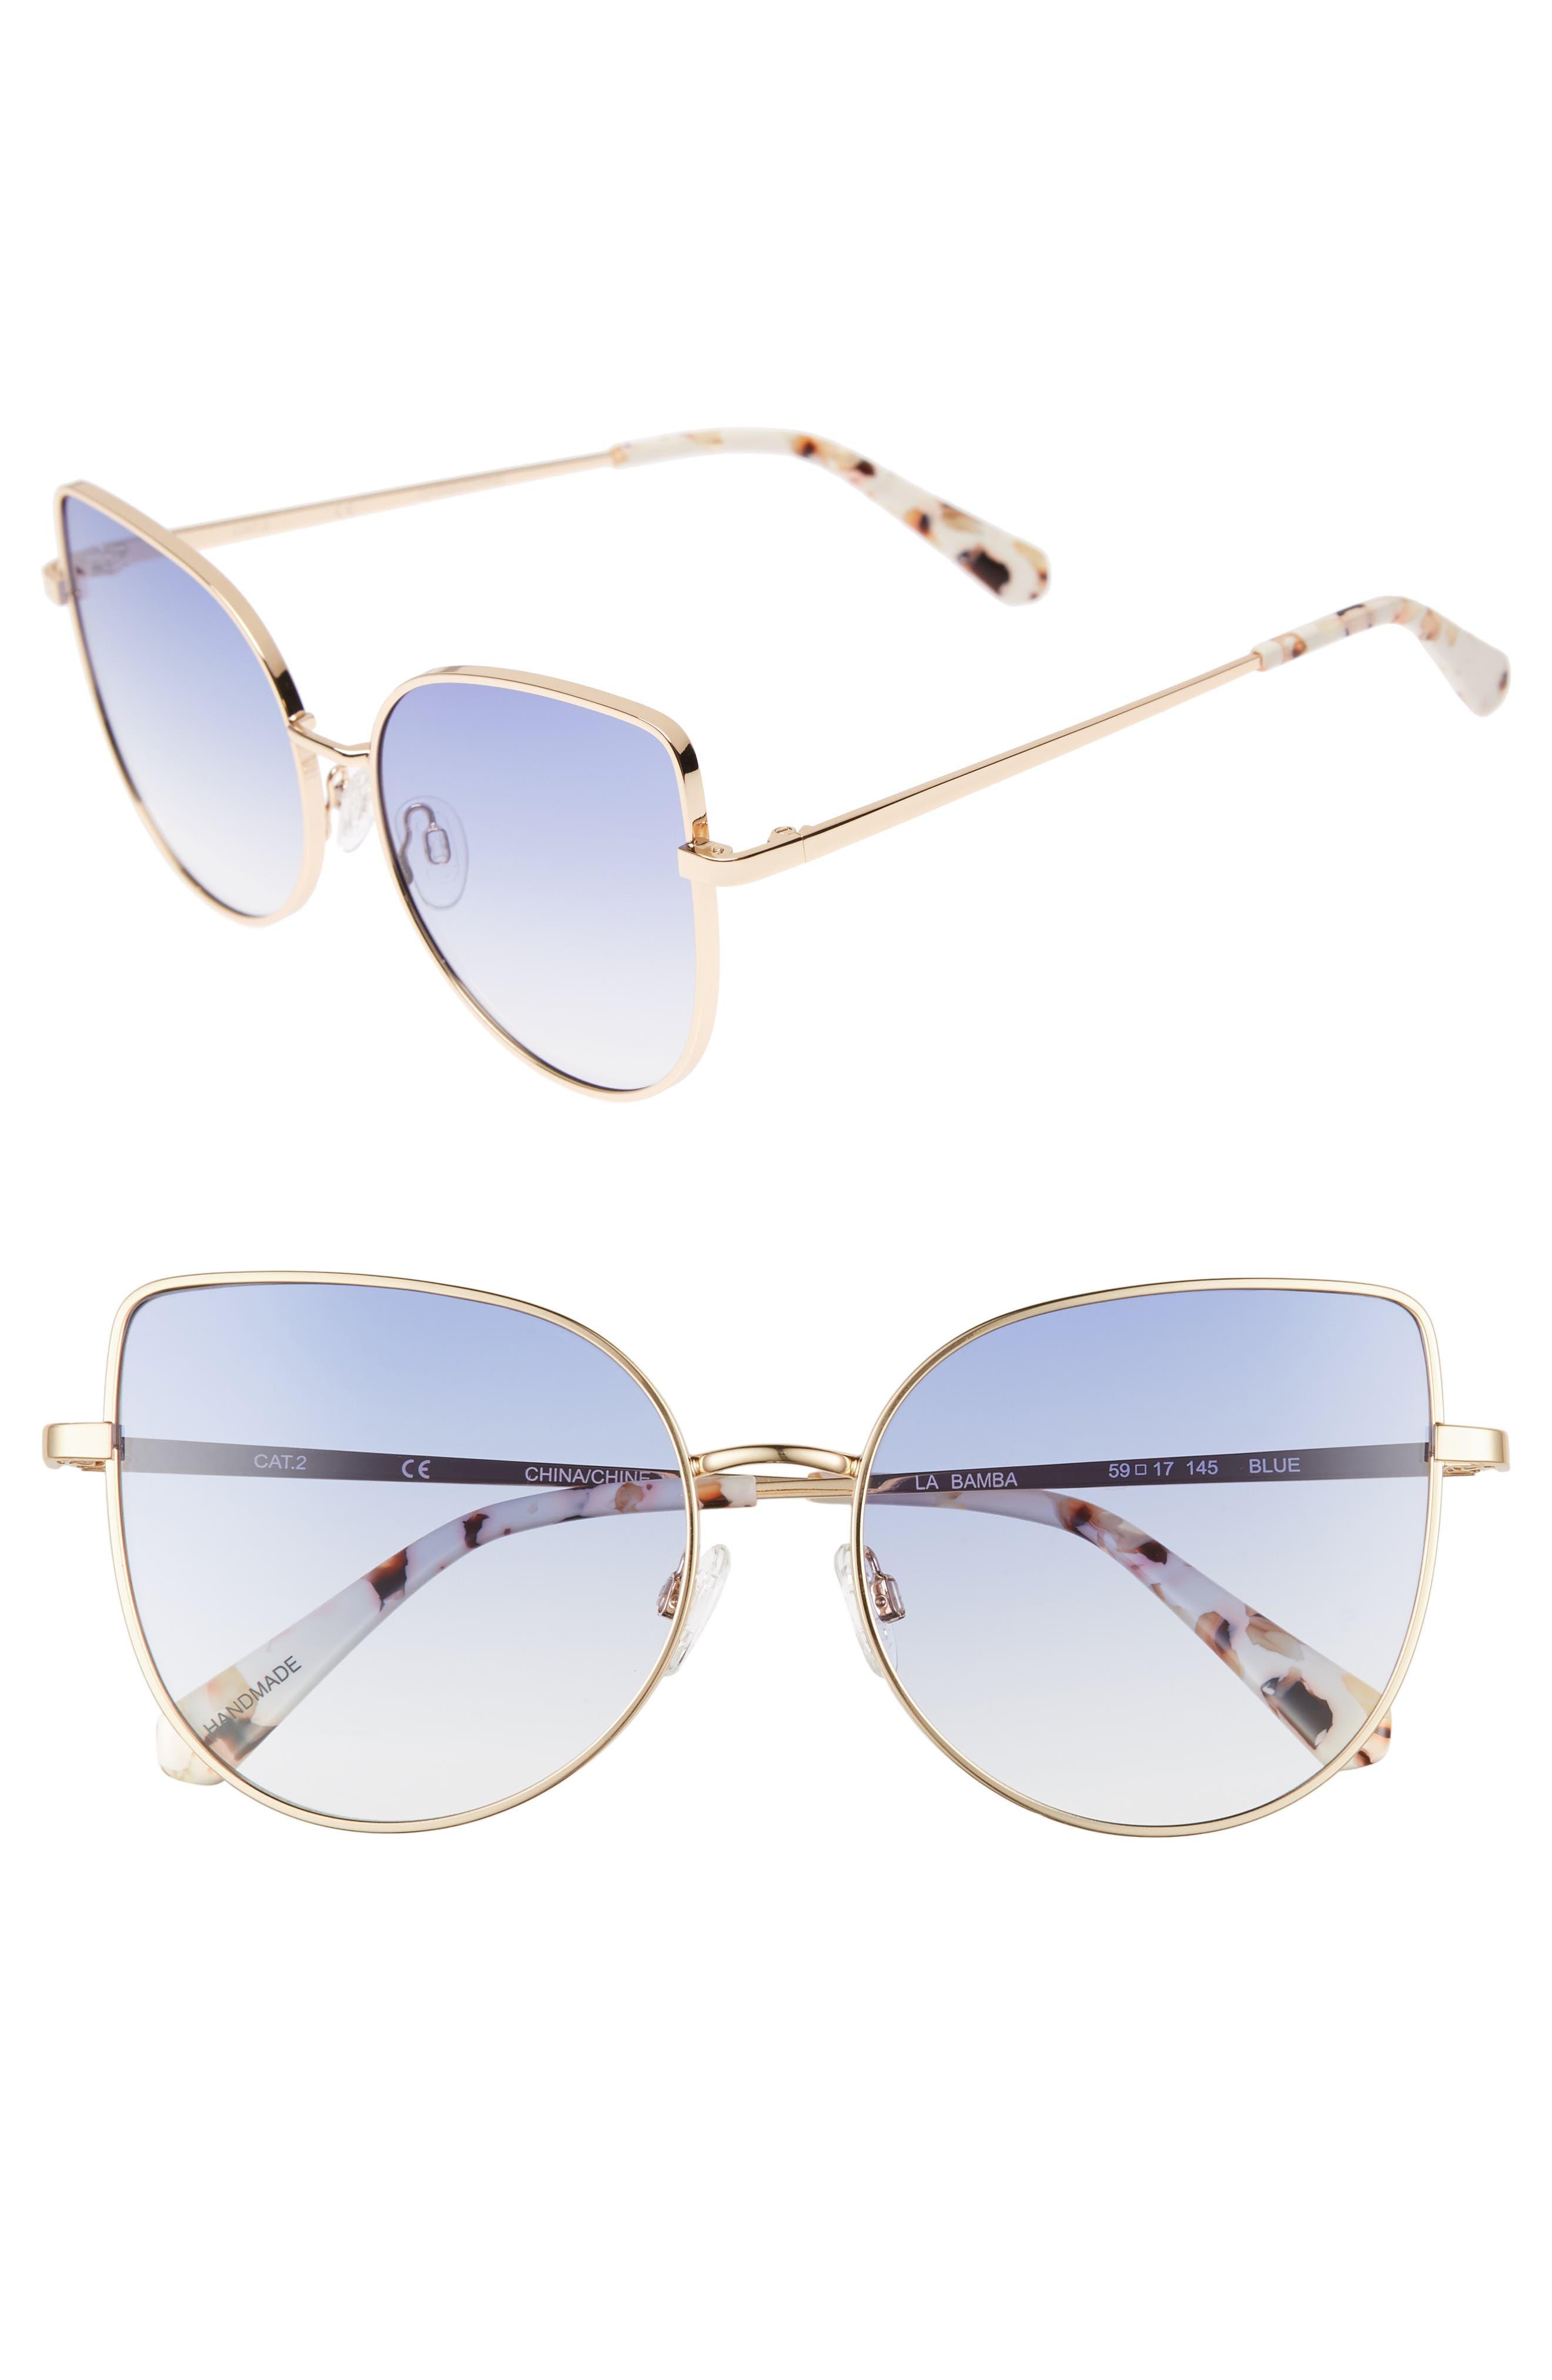 CHELSEA28 La Bamba 59mm Sunglasses, Main, color, 420